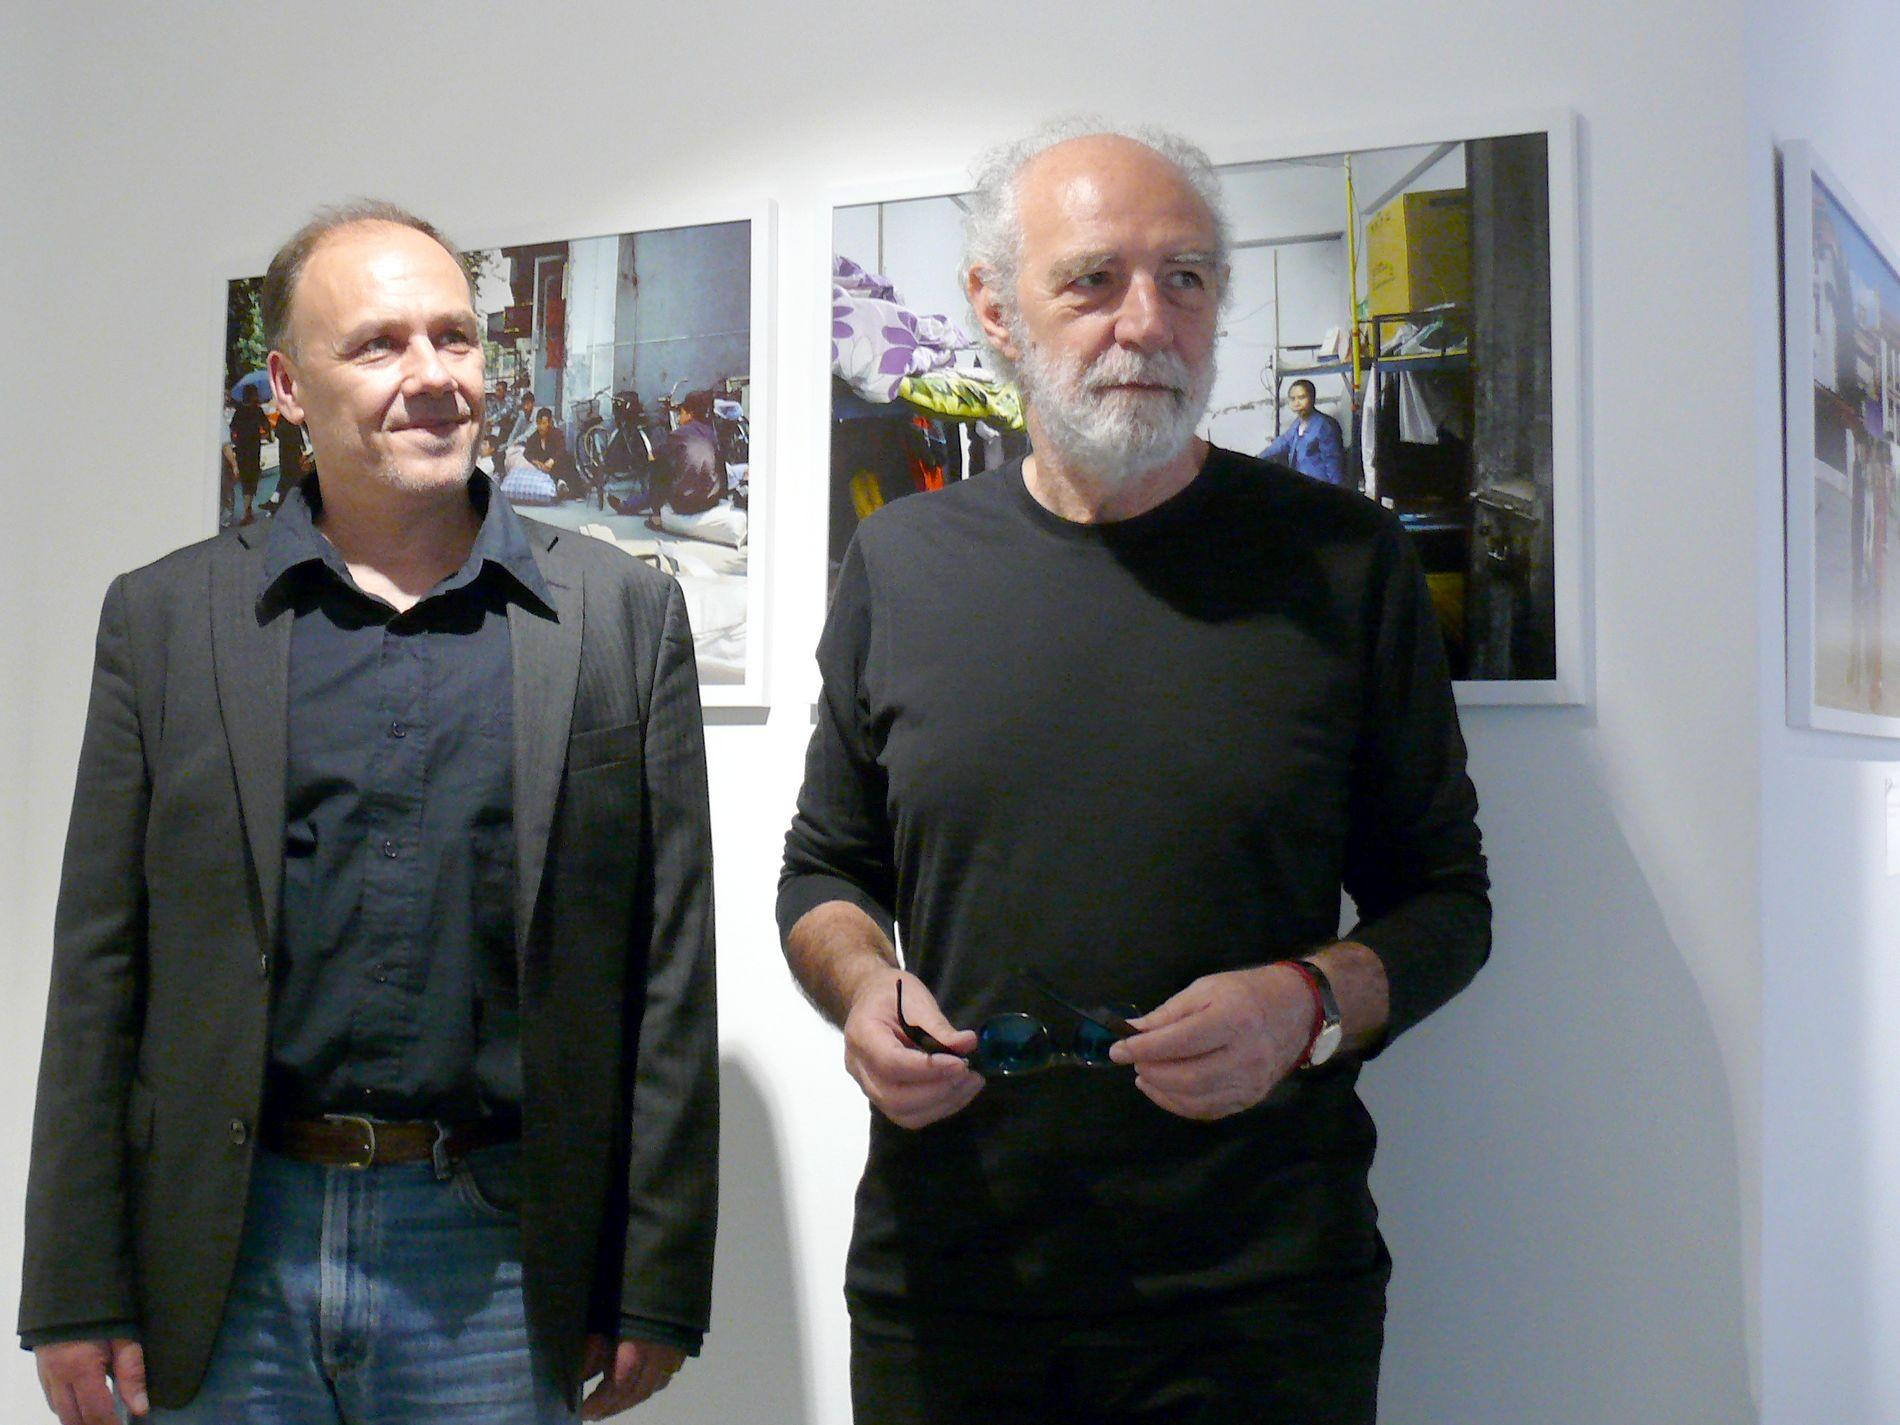 La Cina di Paolo Longo, mostra fotografica a Macerata